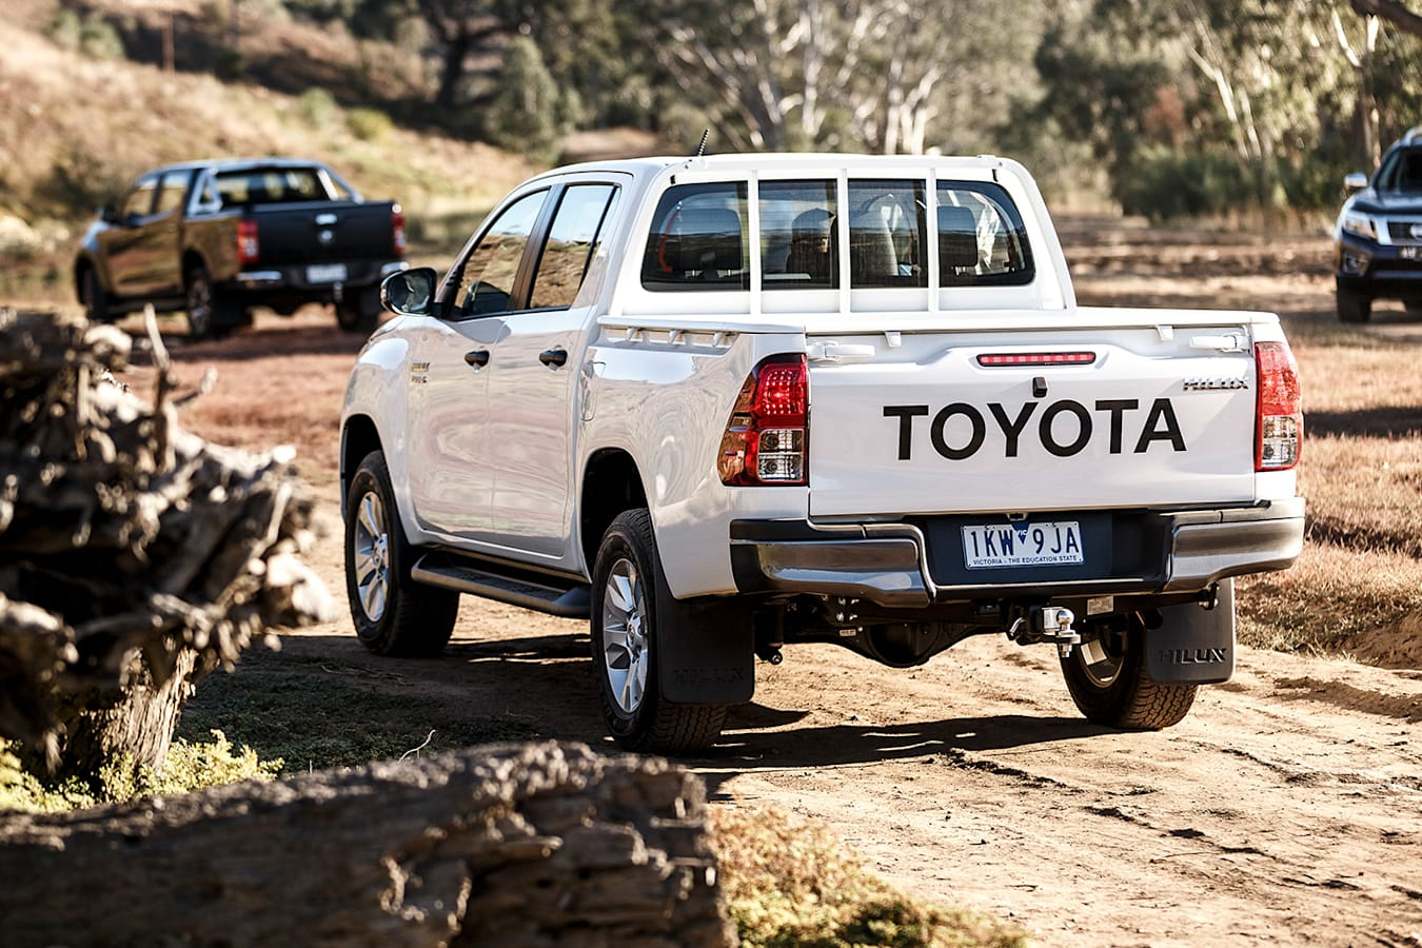 Toyota Hilux Rear Jpg